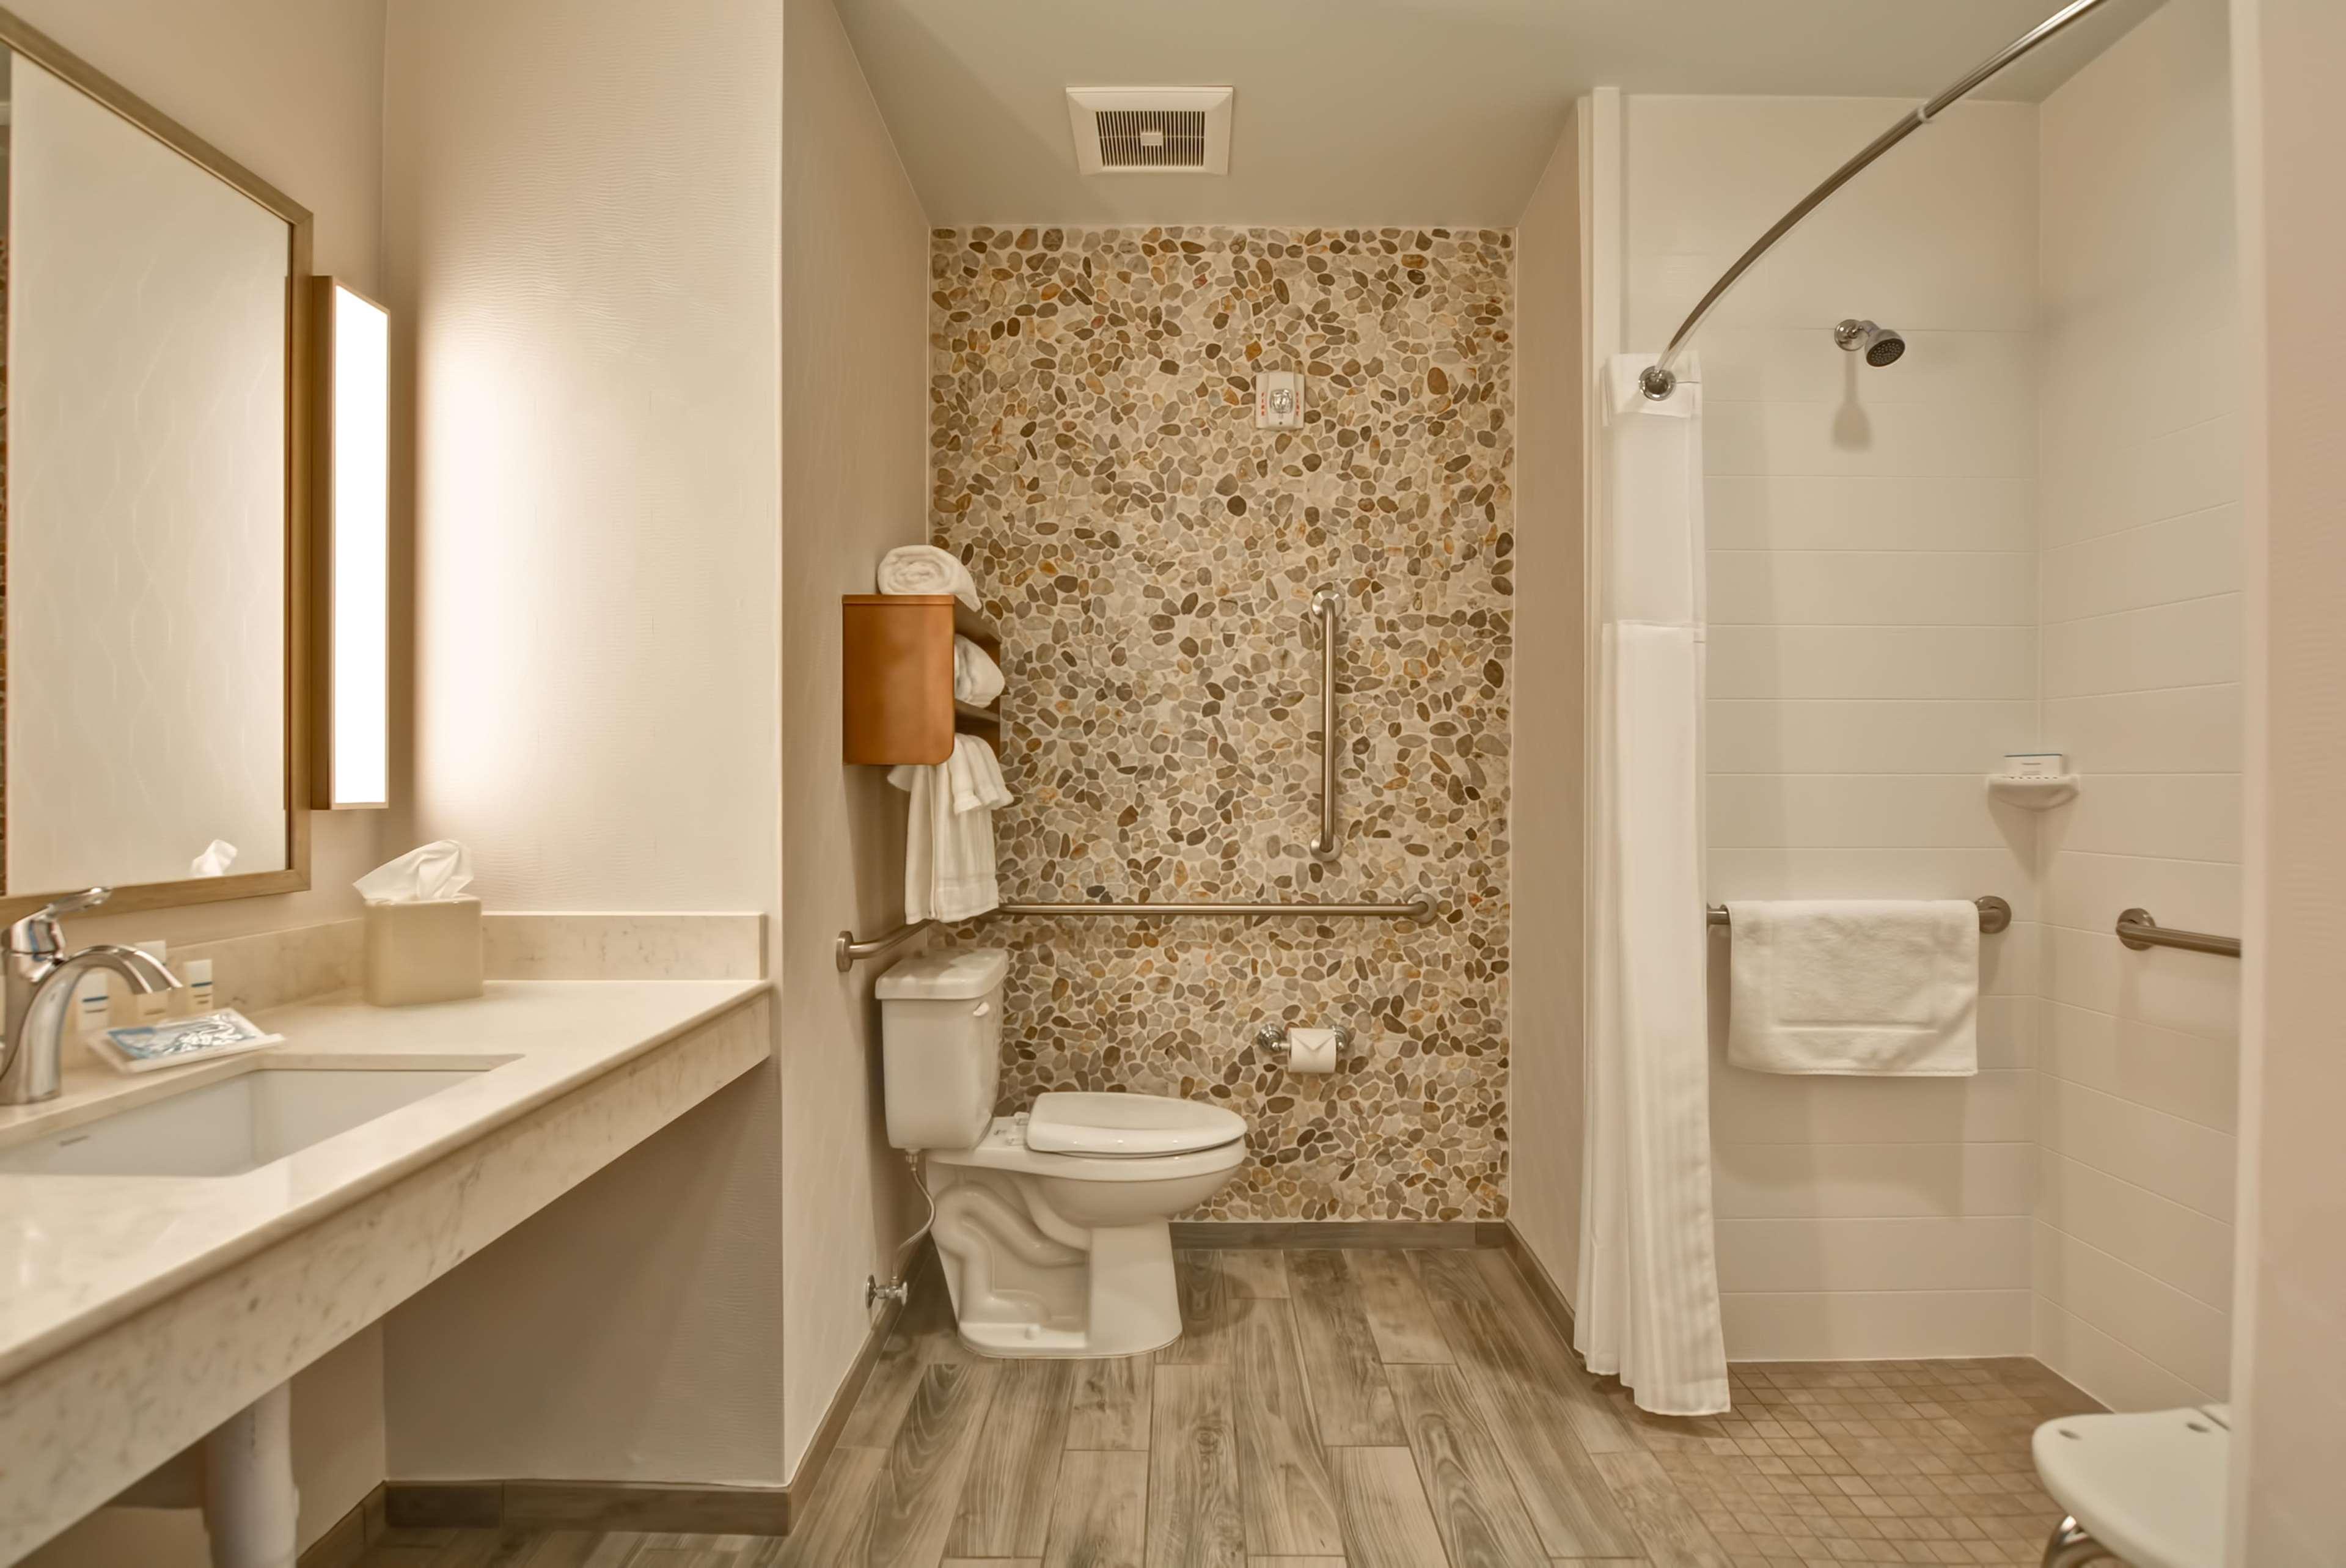 Hilton Garden Inn Phoenix/Tempe ASU Area image 23